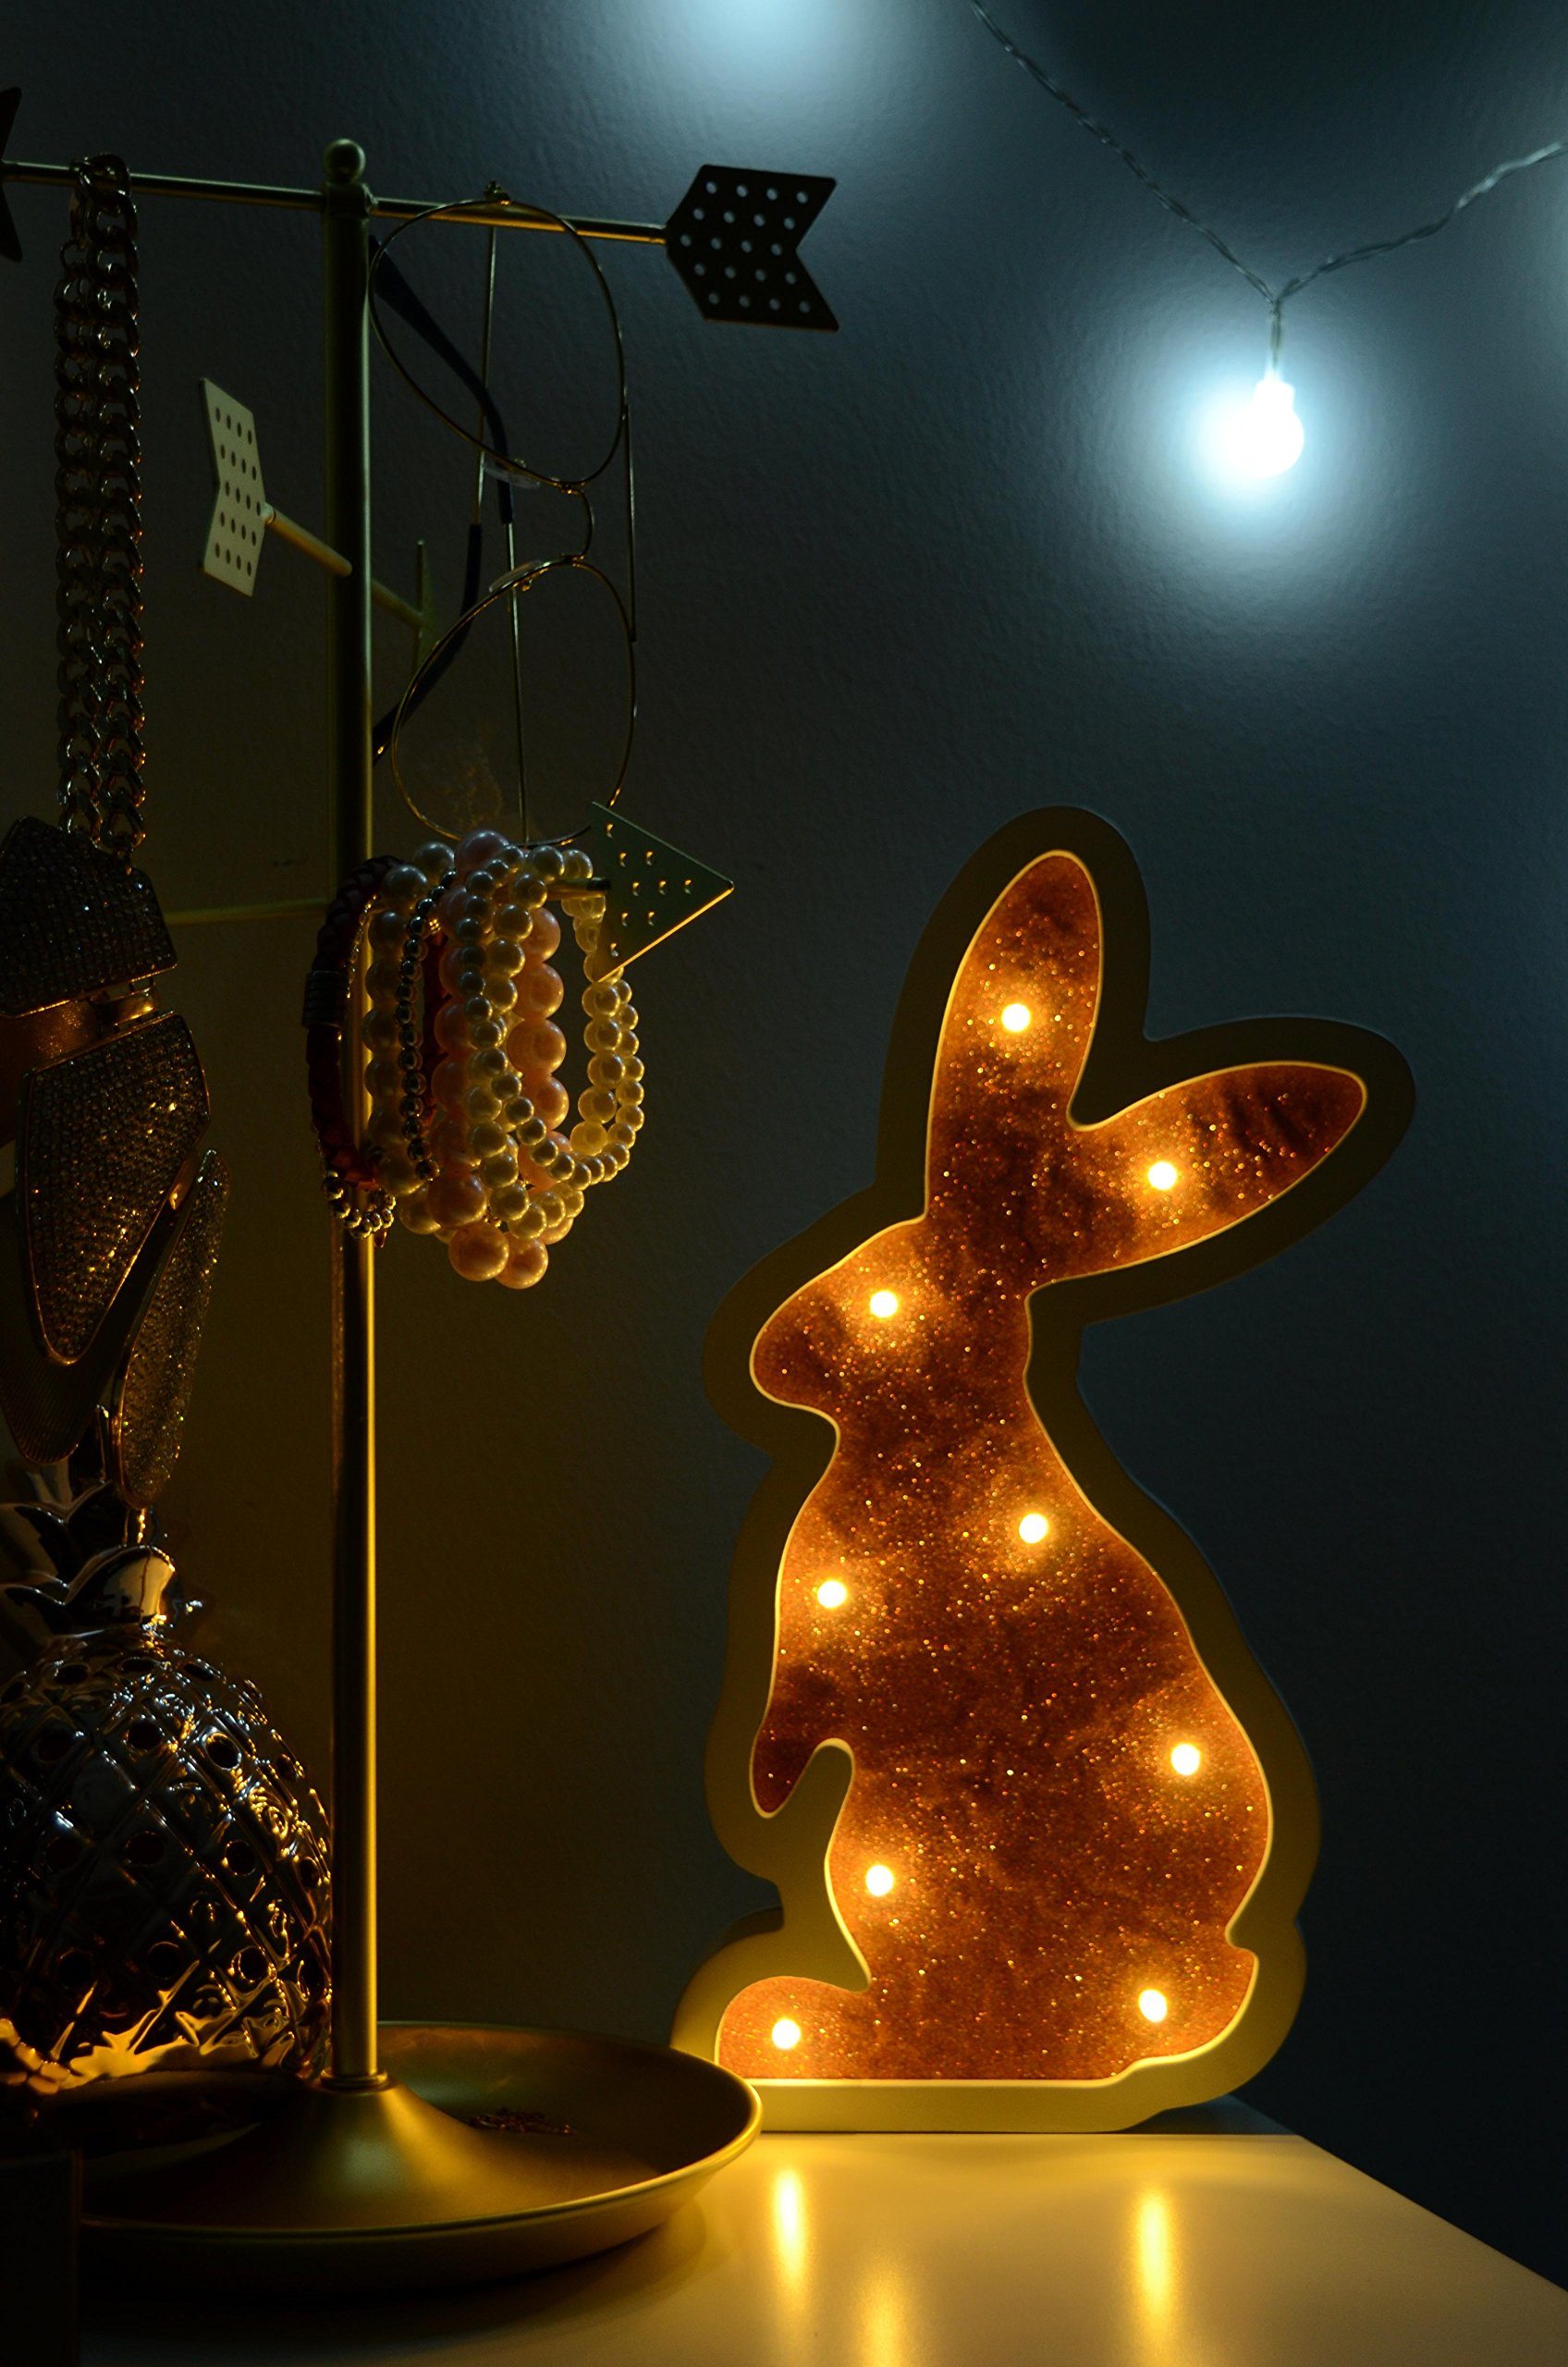 Night Light: Kids Lamp, LED lights, Baby Rest, Bunny Animal, Bedroom Home Decoration, Baby shower